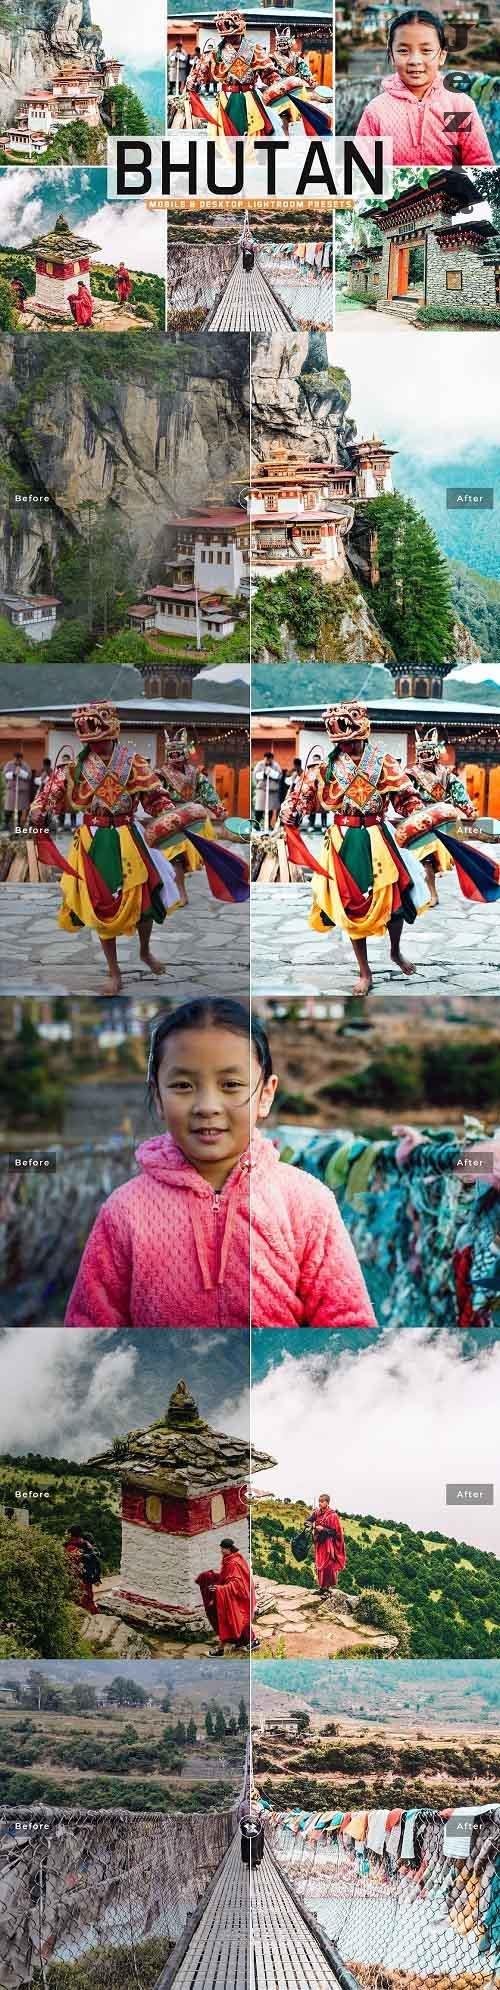 Bhutan Pro Lightroom Presets - 5542490 - Mobile & Desktop